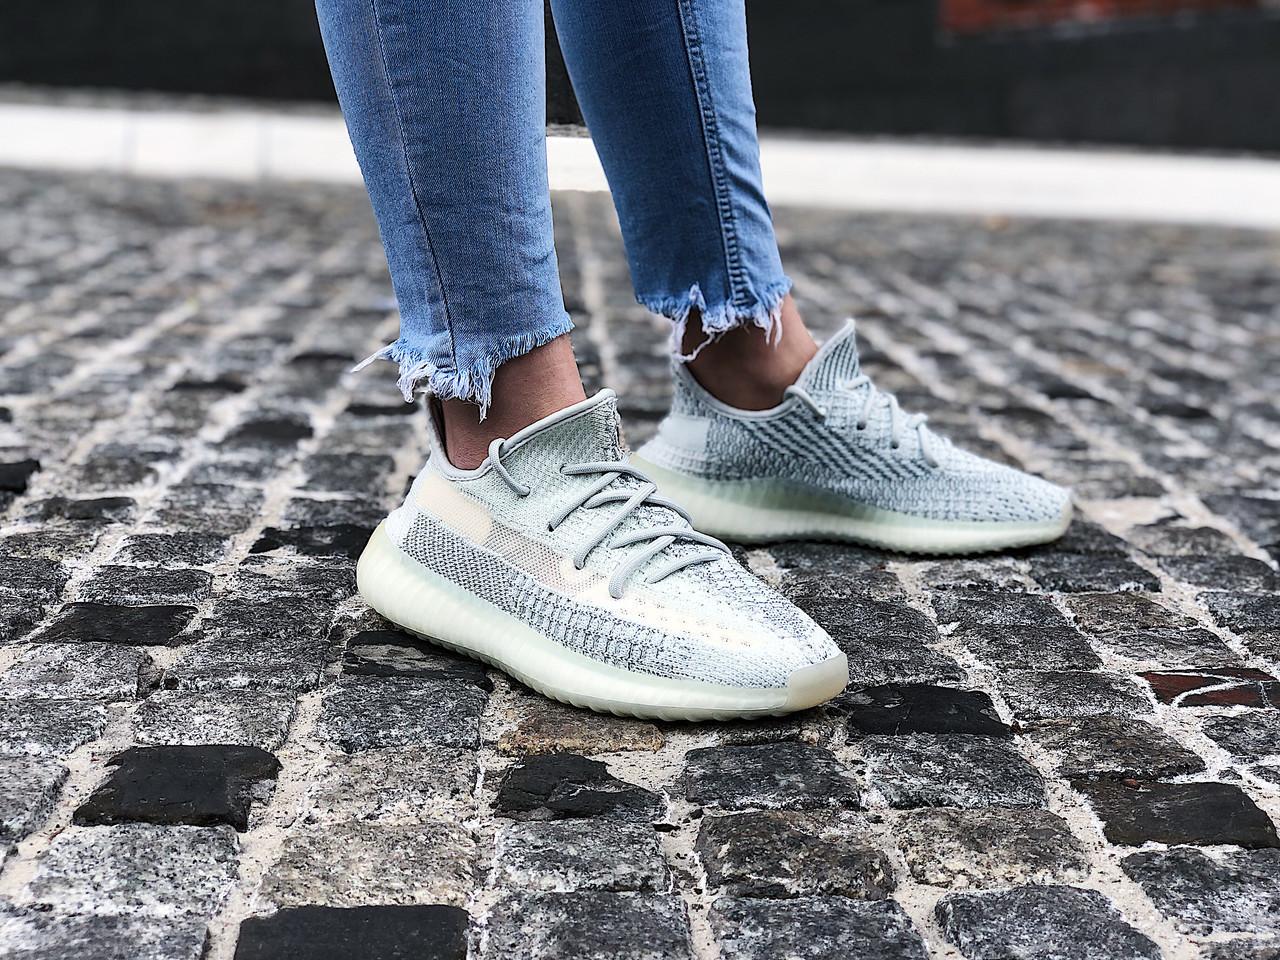 "Кроссовки женские Adidas Yeezy Boost 350 V2 ""Cloud White Reflective"" (Размеры:41)"